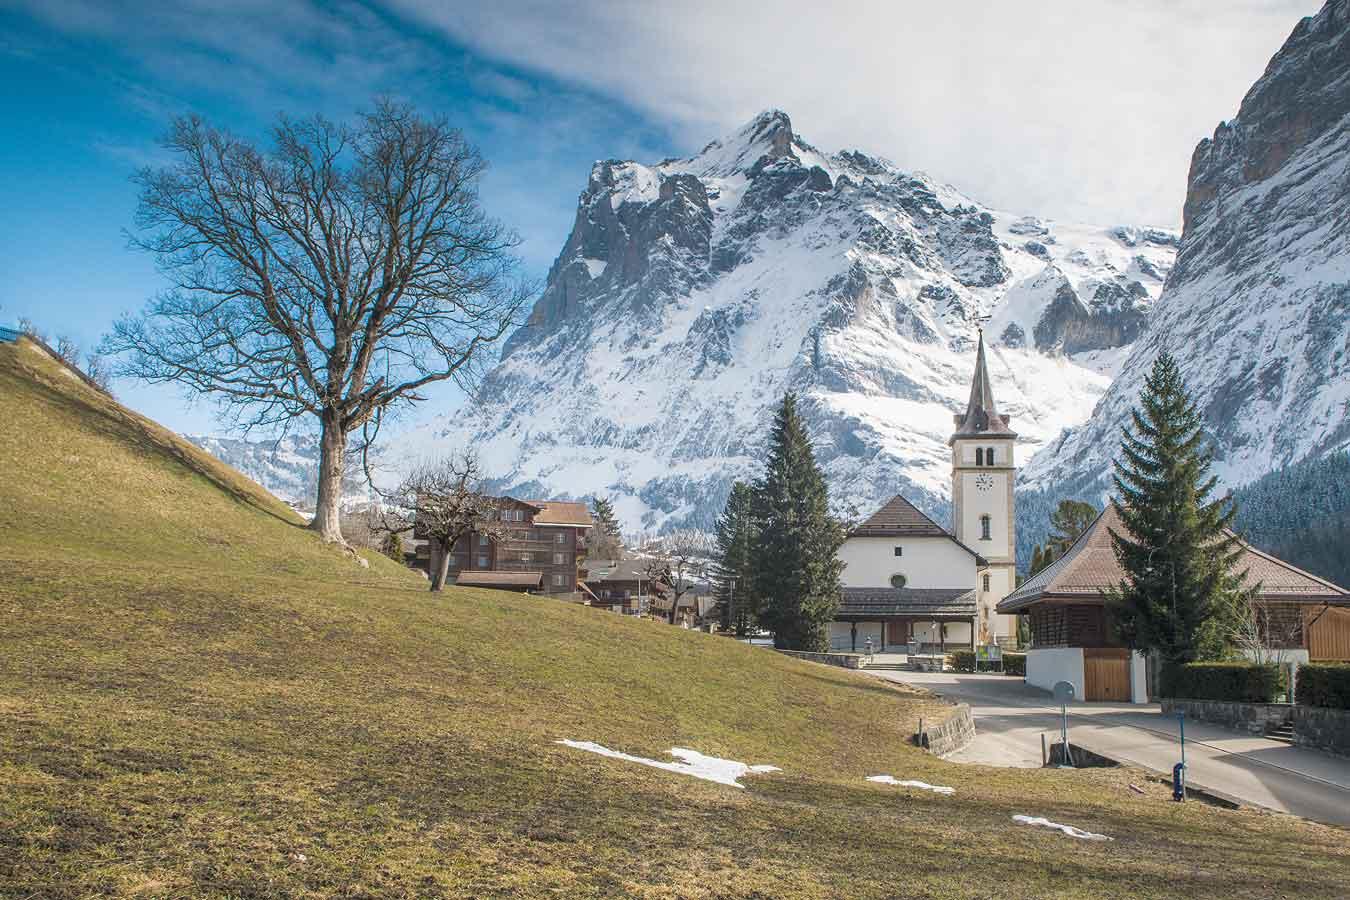 Photographer Grindelwald Switzerland